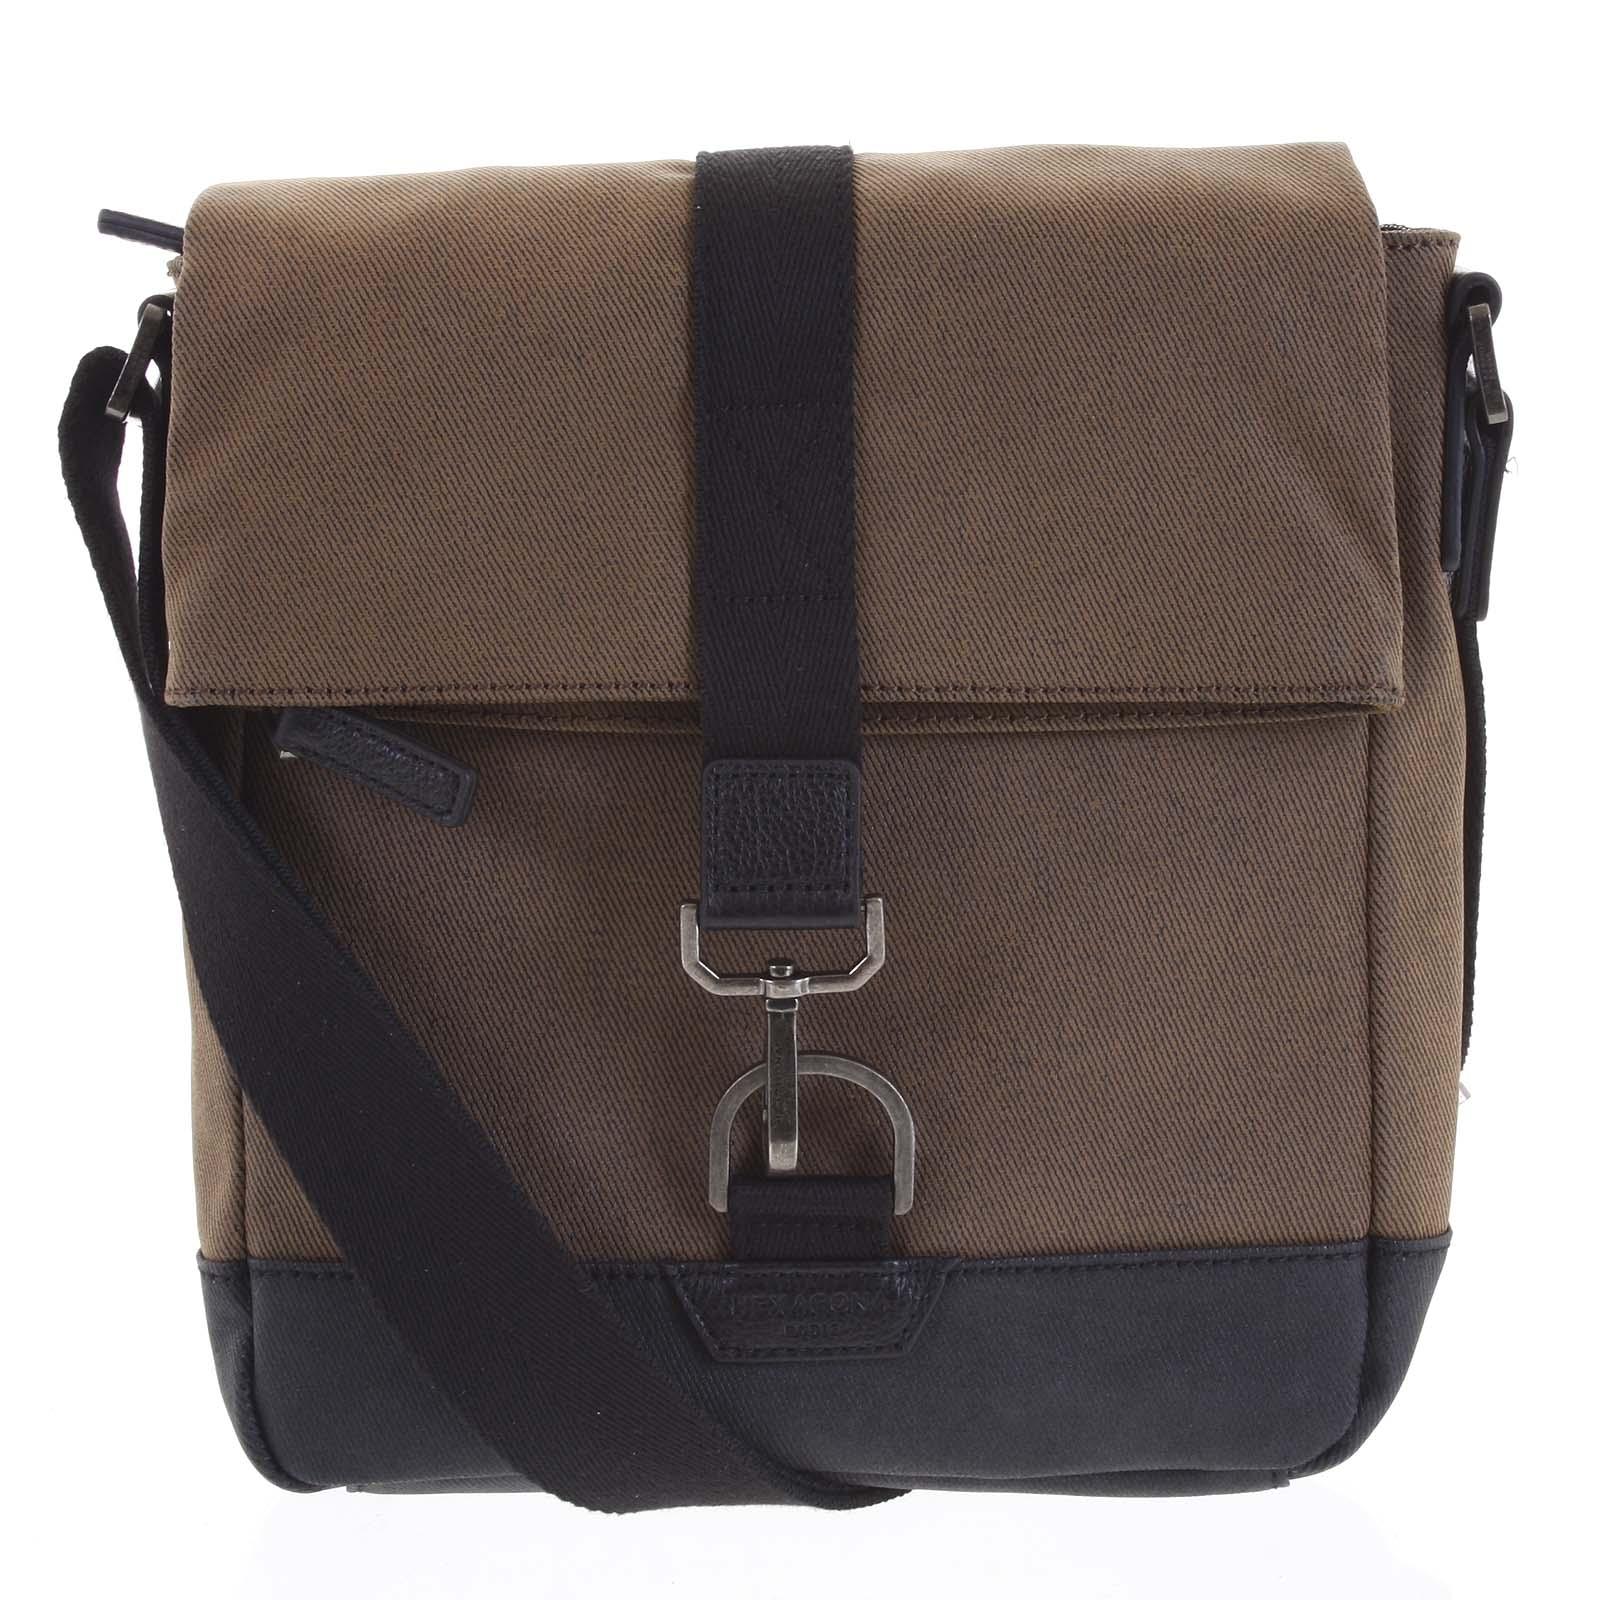 Pánská taška přes rameno hnědá - Hexagona Bennio